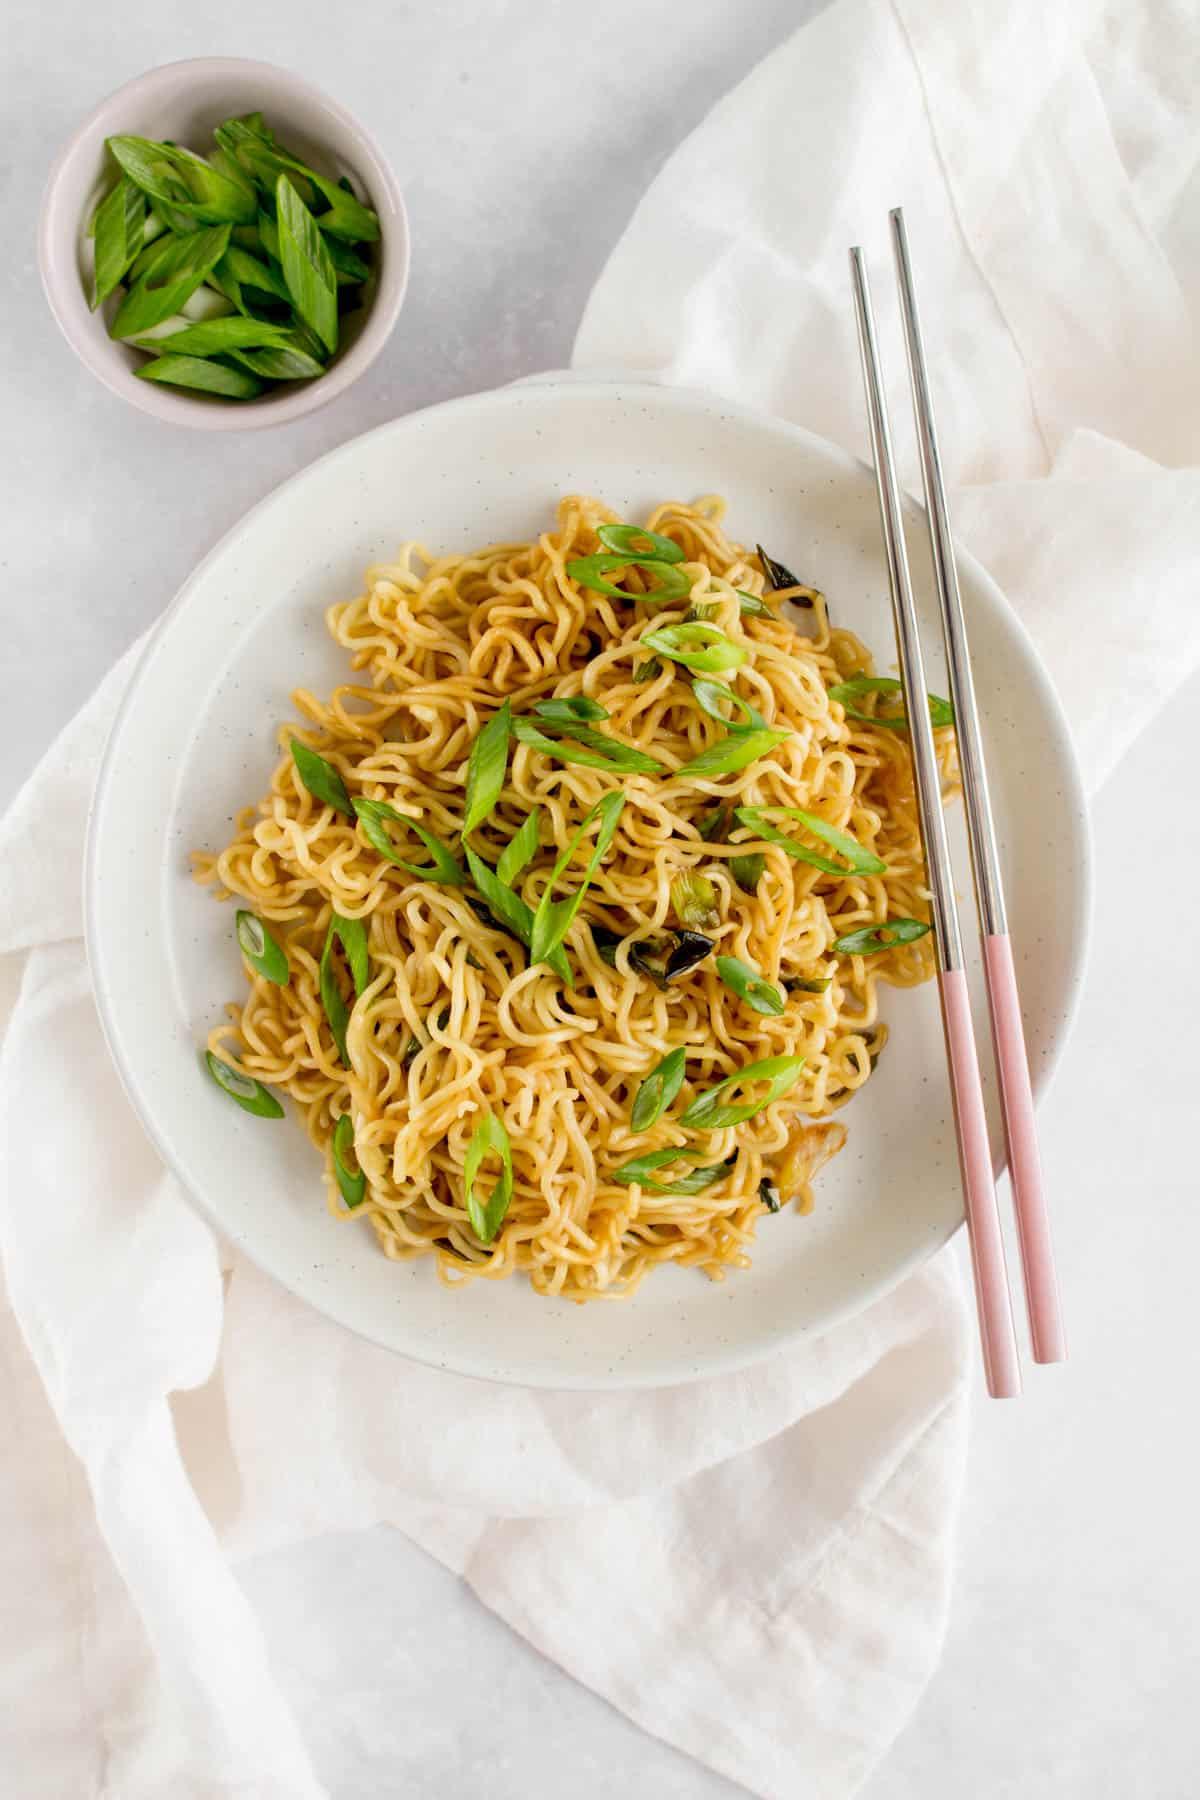 Plate of garlic scallion noodles with chopsticks beside it.